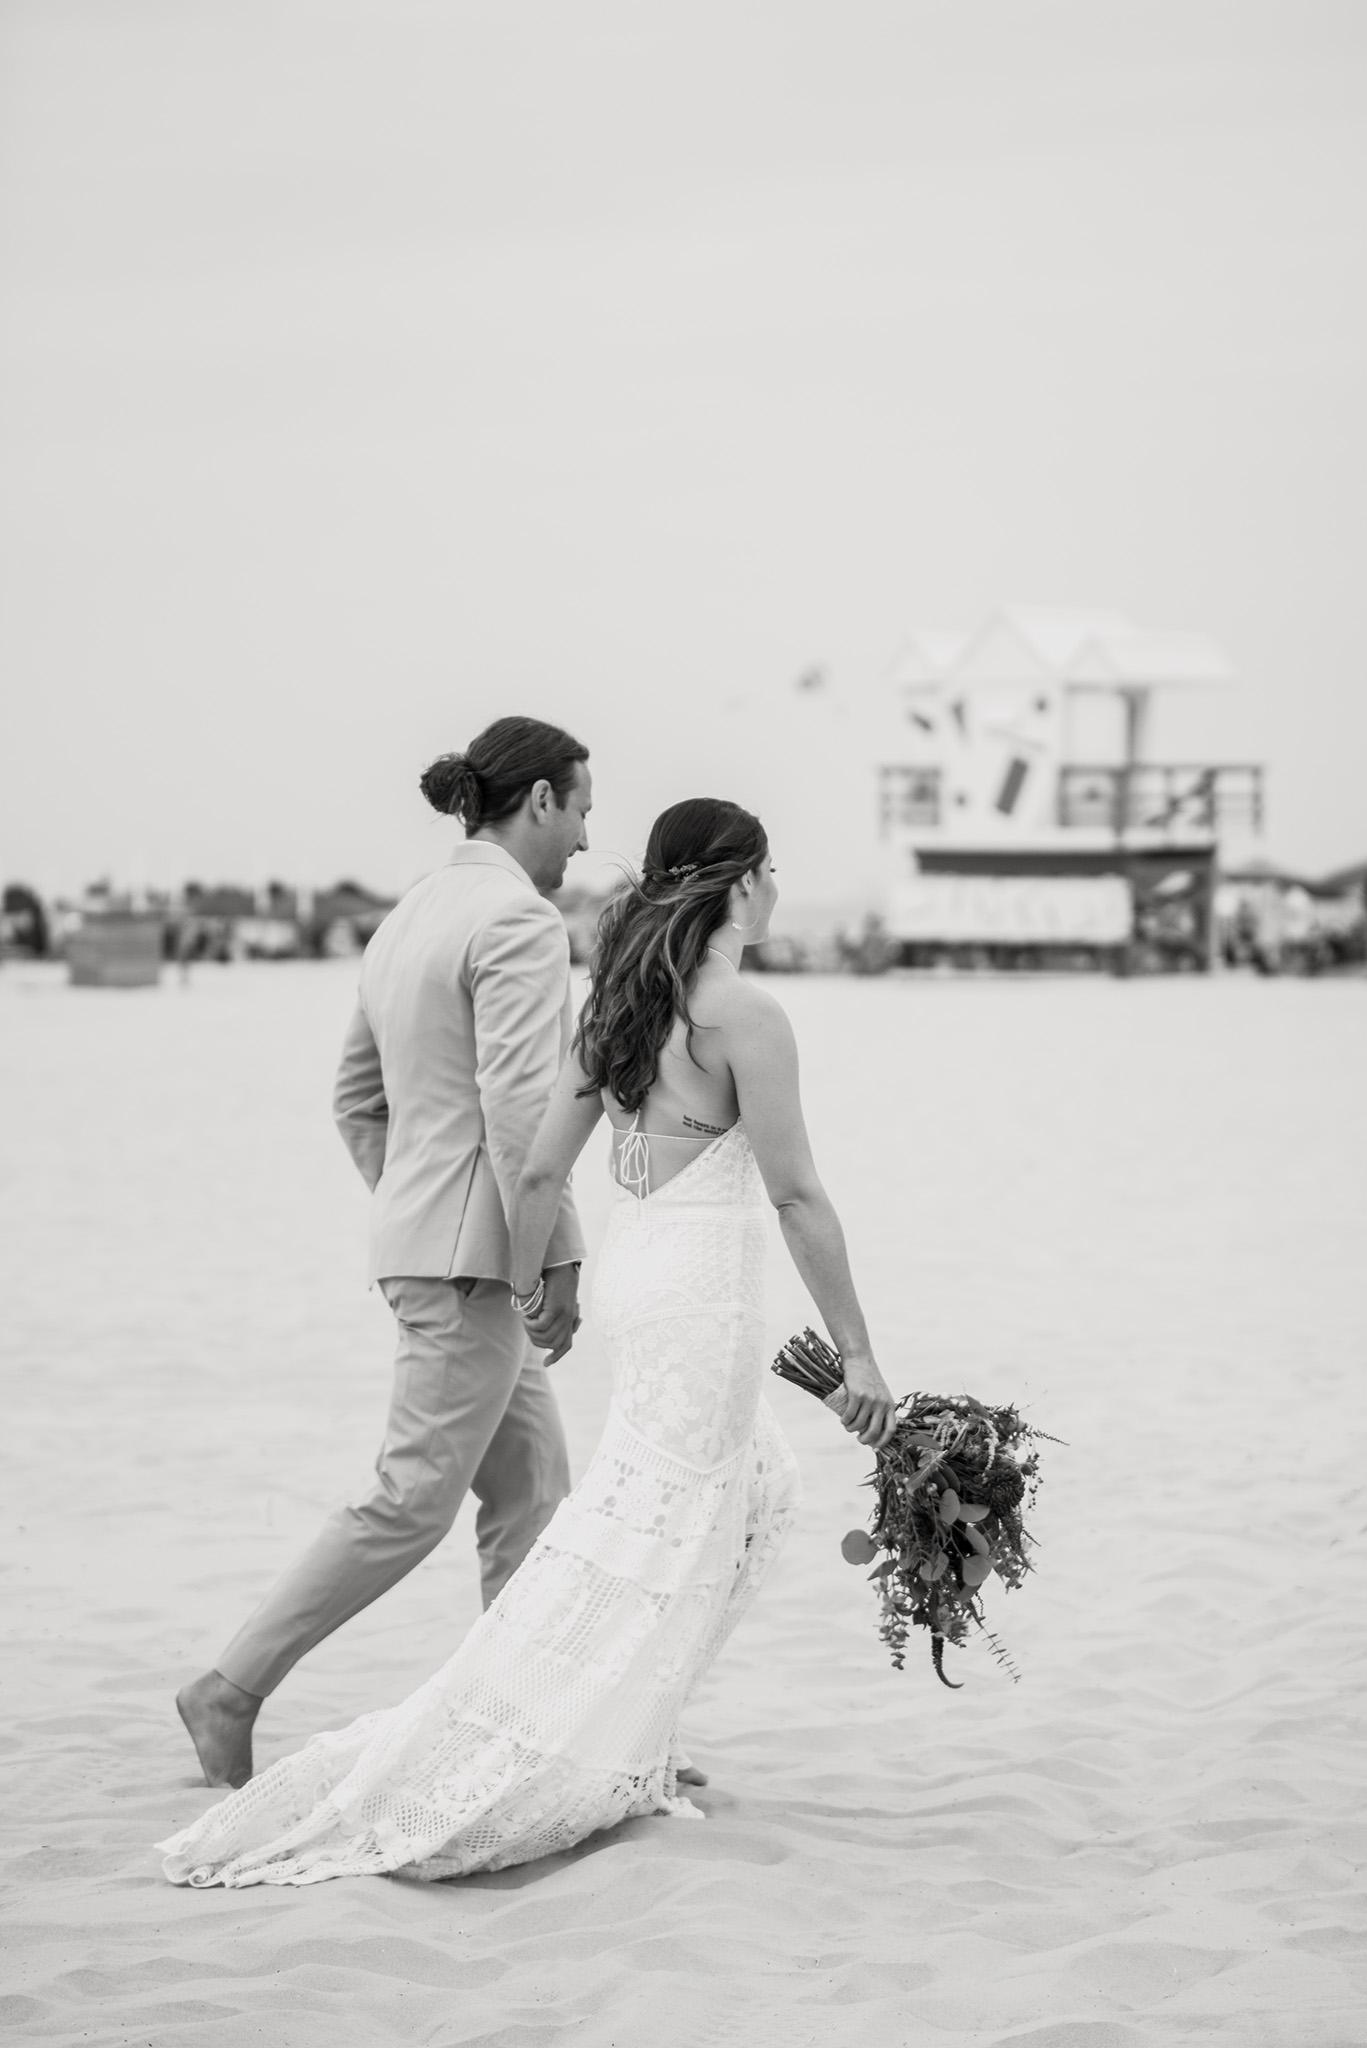 icona_diamond_beach_wedding_38.jpg